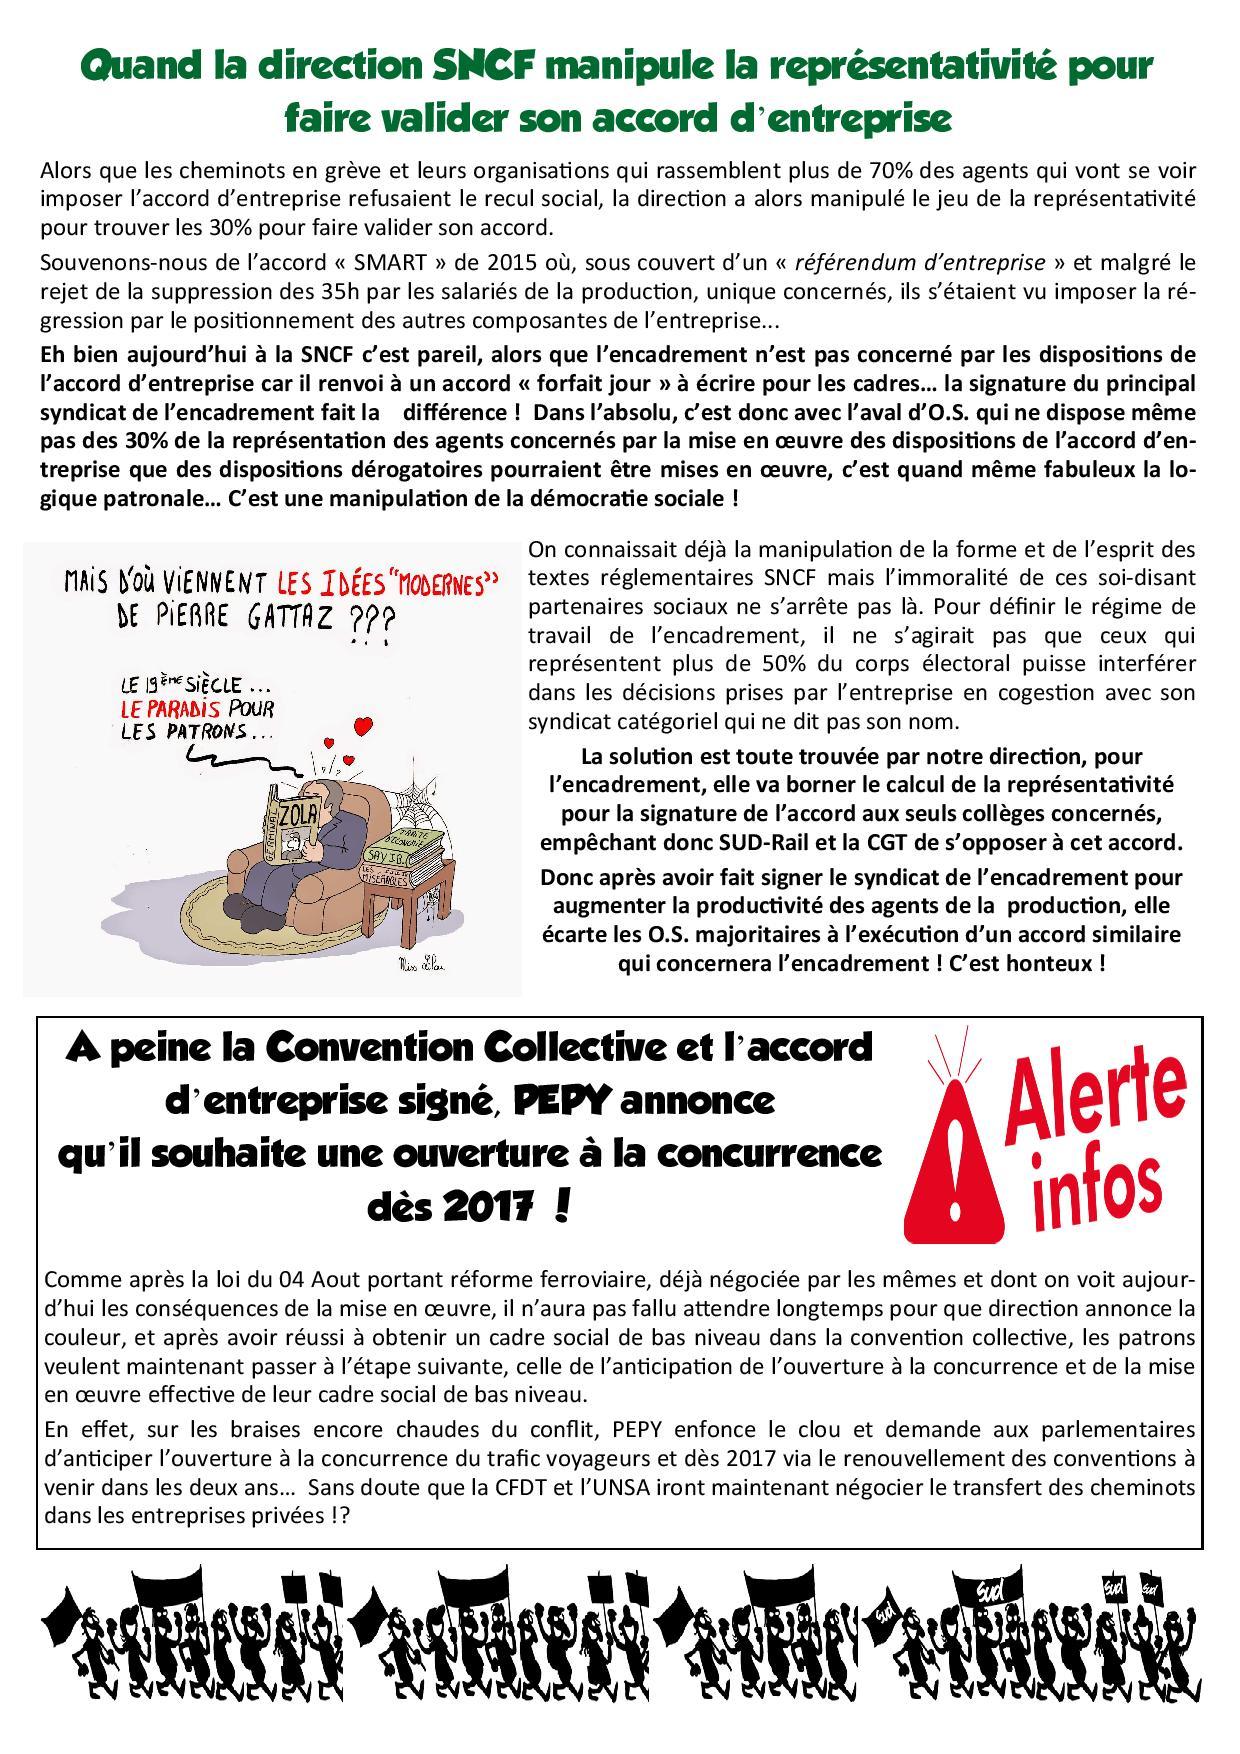 RH0077 saccage par cfdt 06-2016-page-003